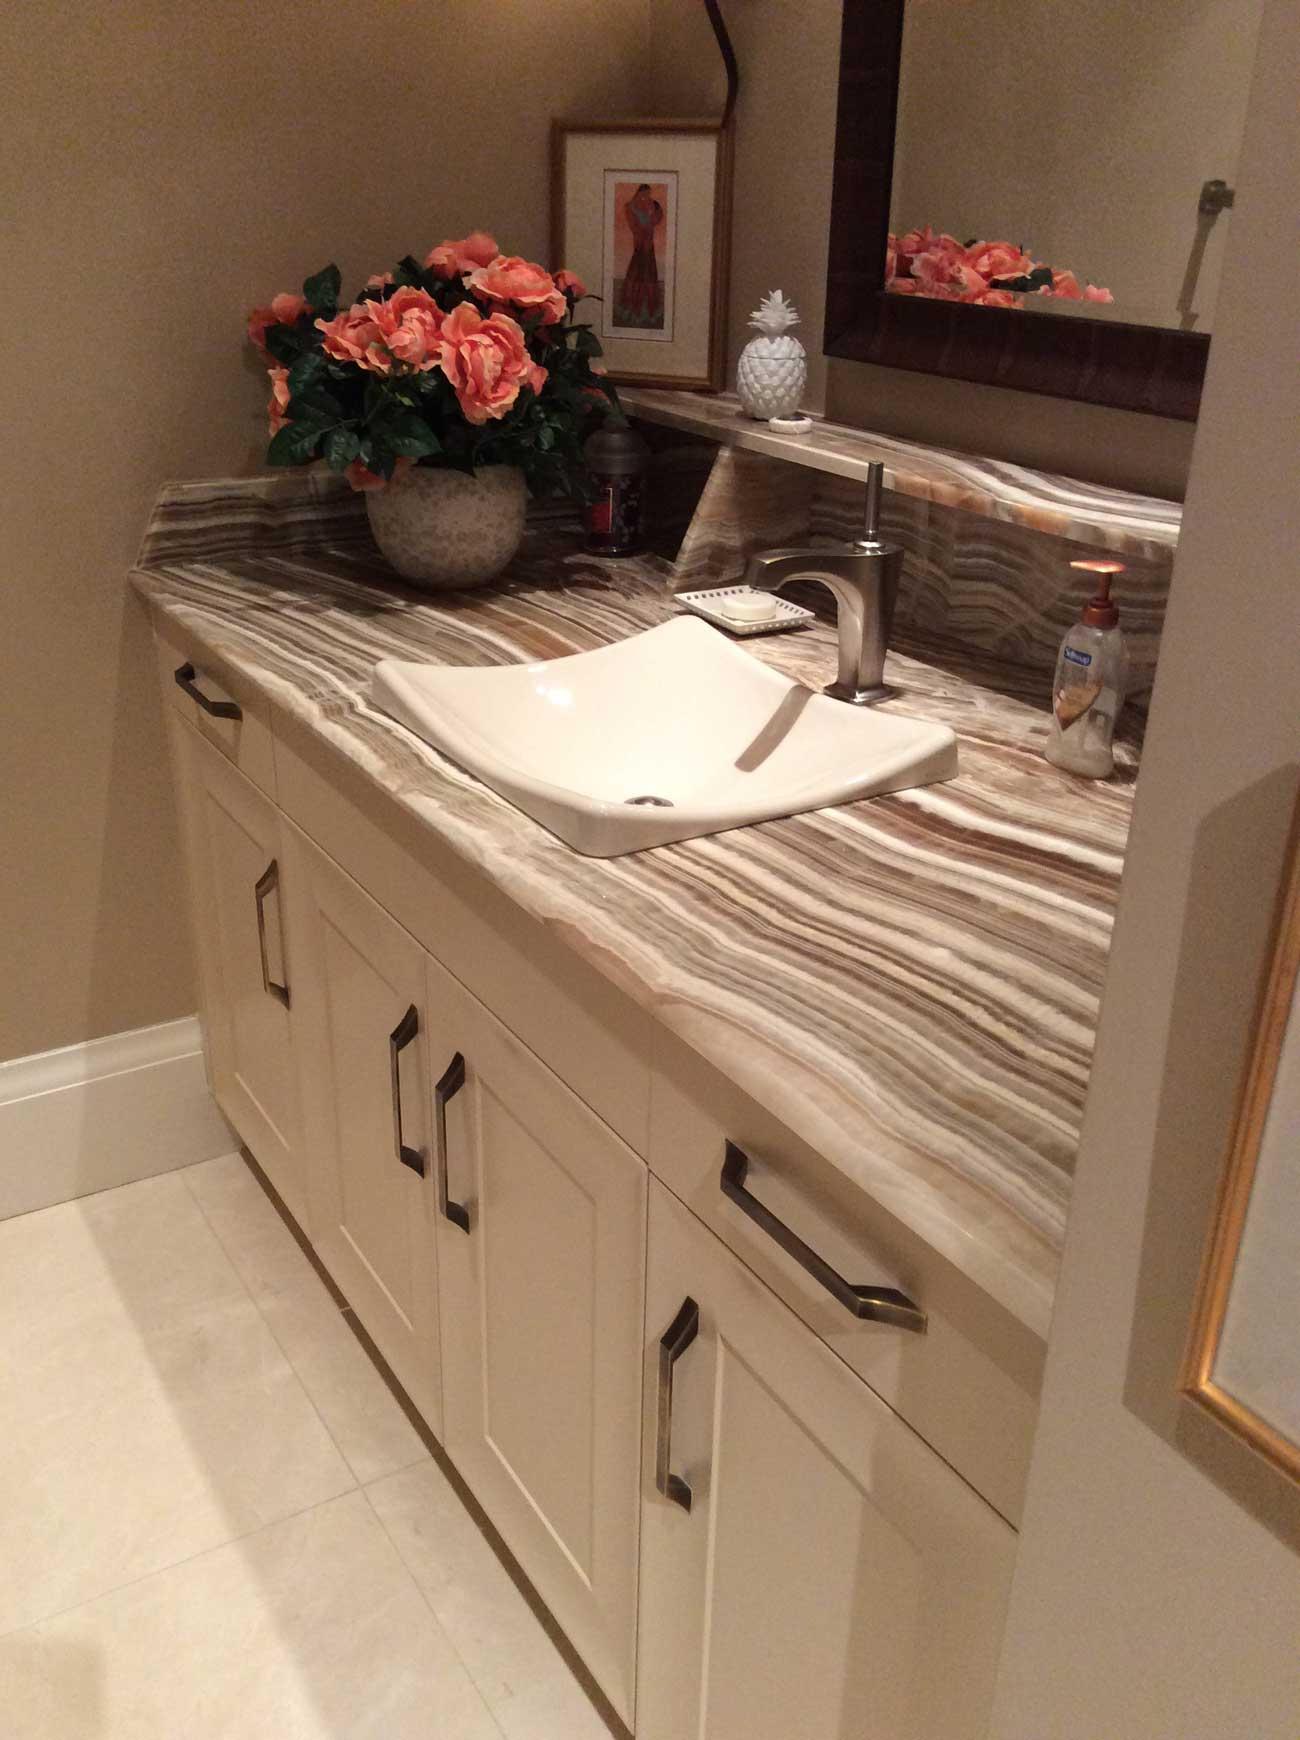 Vanit 2 salle de bain sur mesure zone cuisines zone for Zone salle de bain